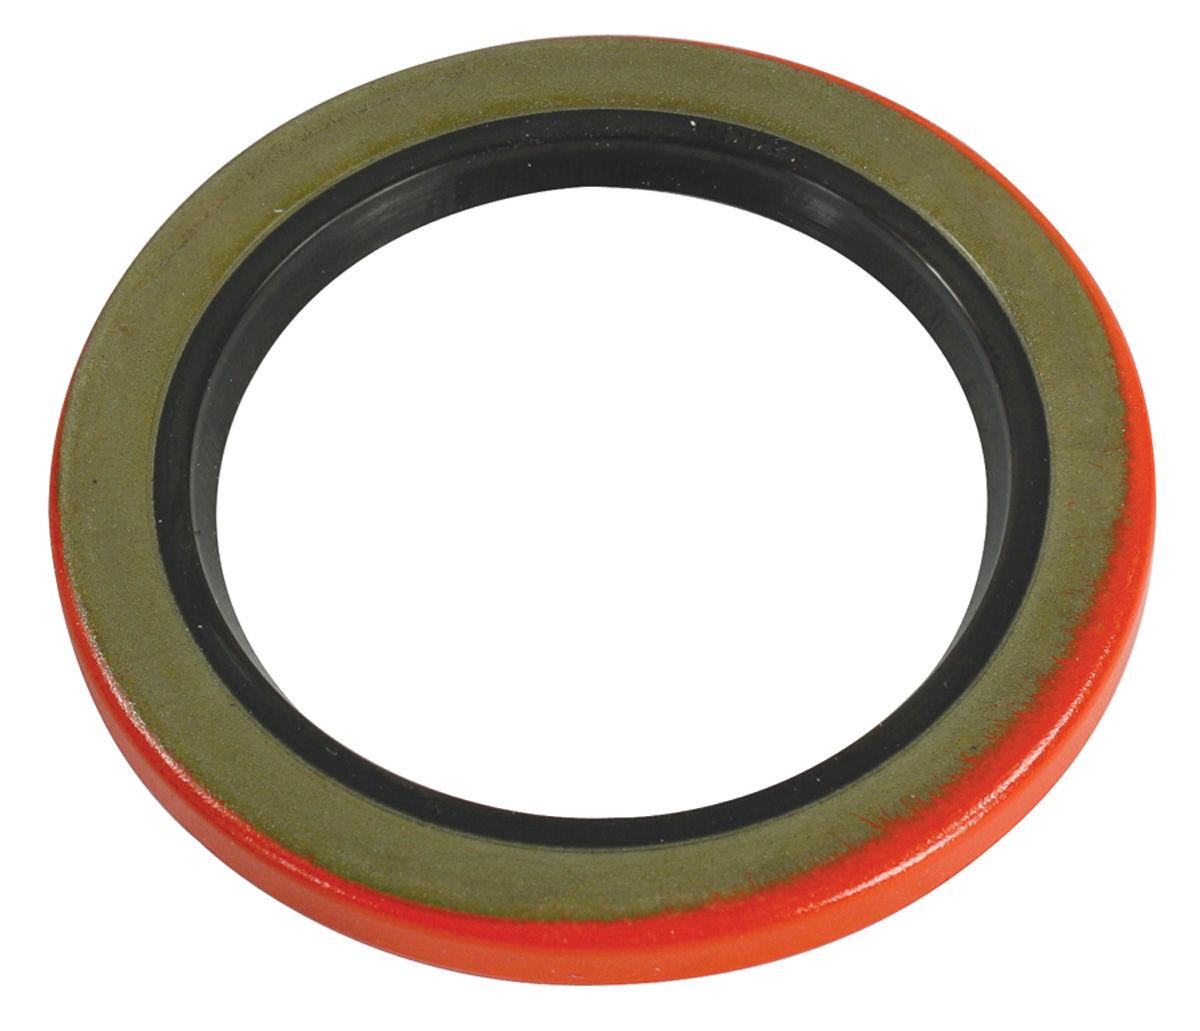 Wheel Seal, Rear, 1965-70 Bonneville/Catalina, 1965-68 Grand Prix